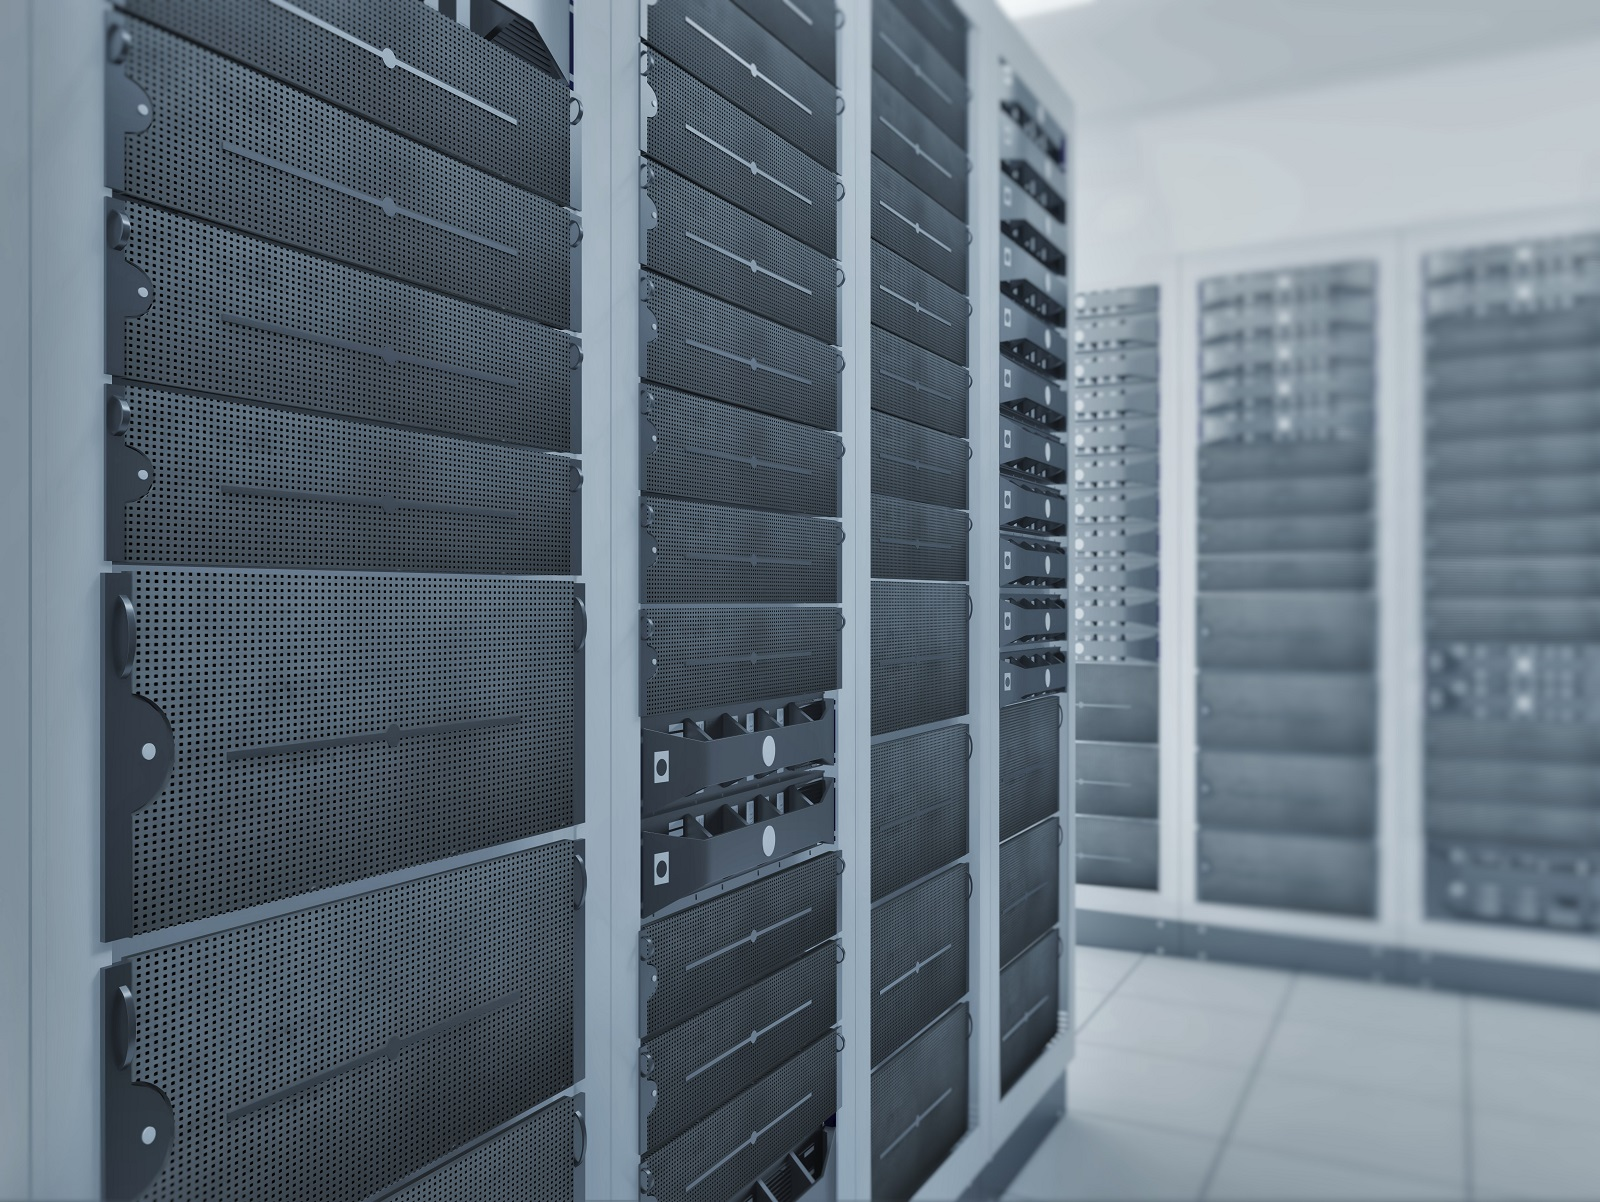 network-server-room-PW46XSN